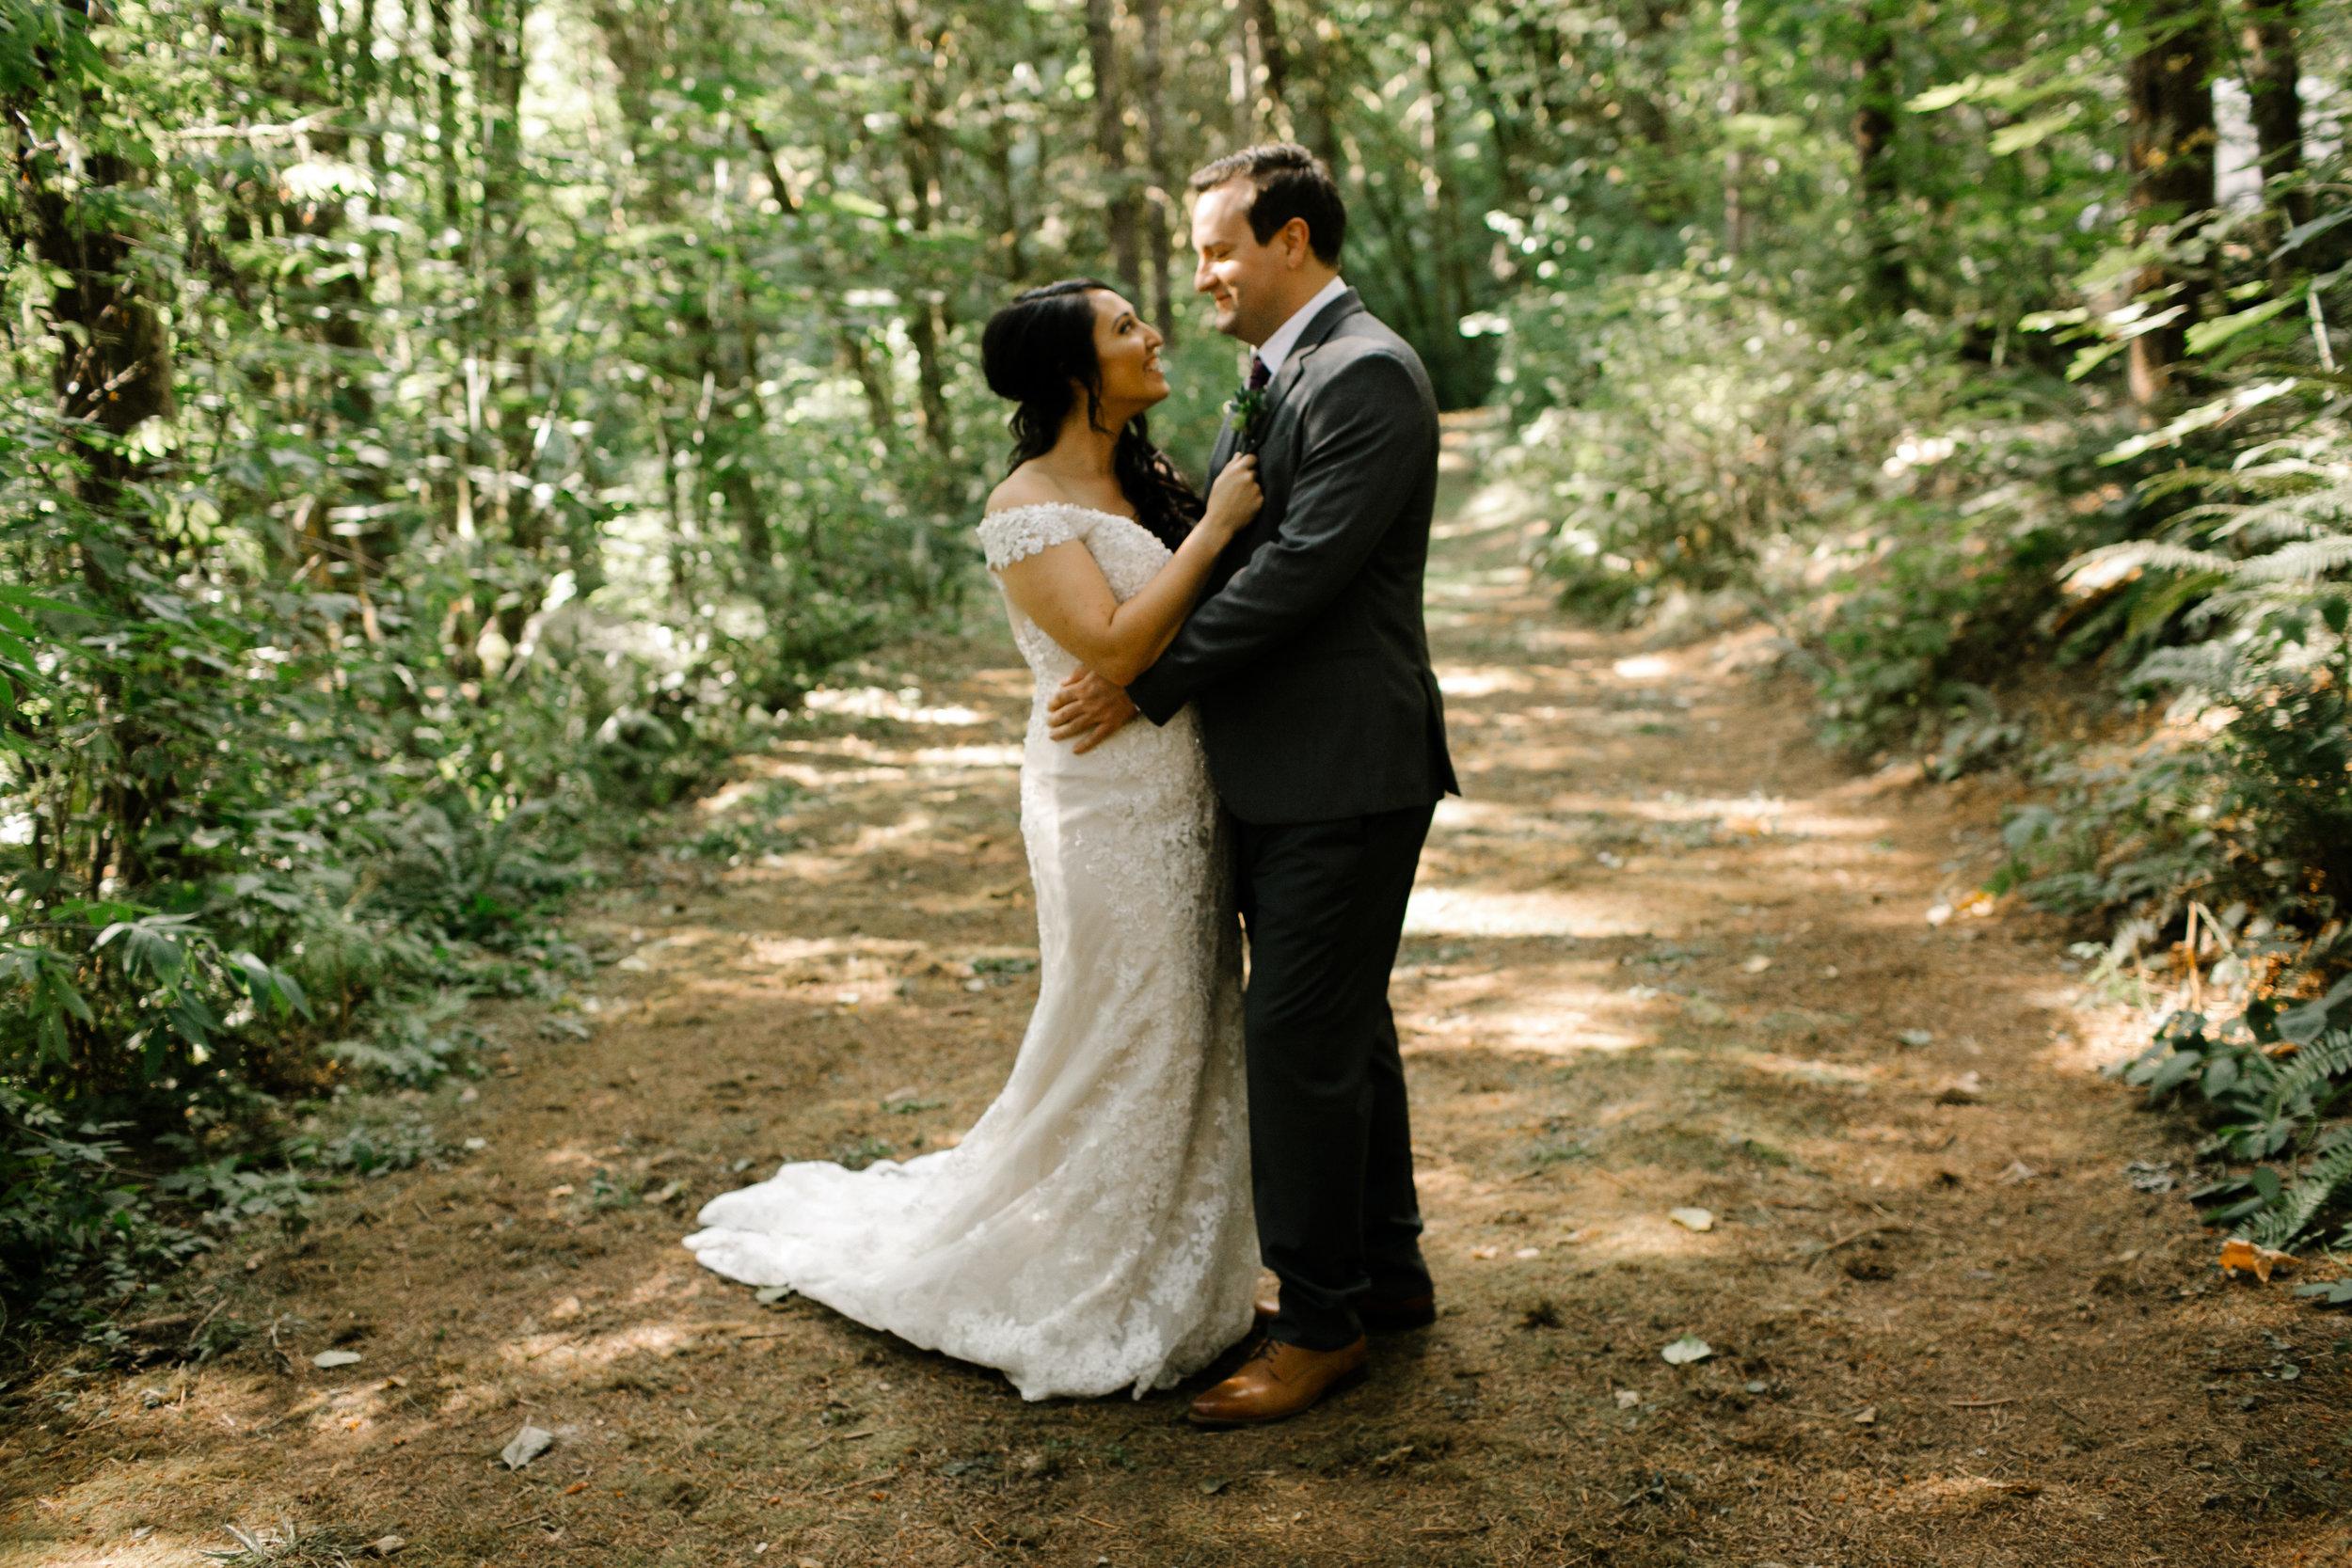 Sevlynn-Photography-Teresa-Chandler-Wedding-18.jpg